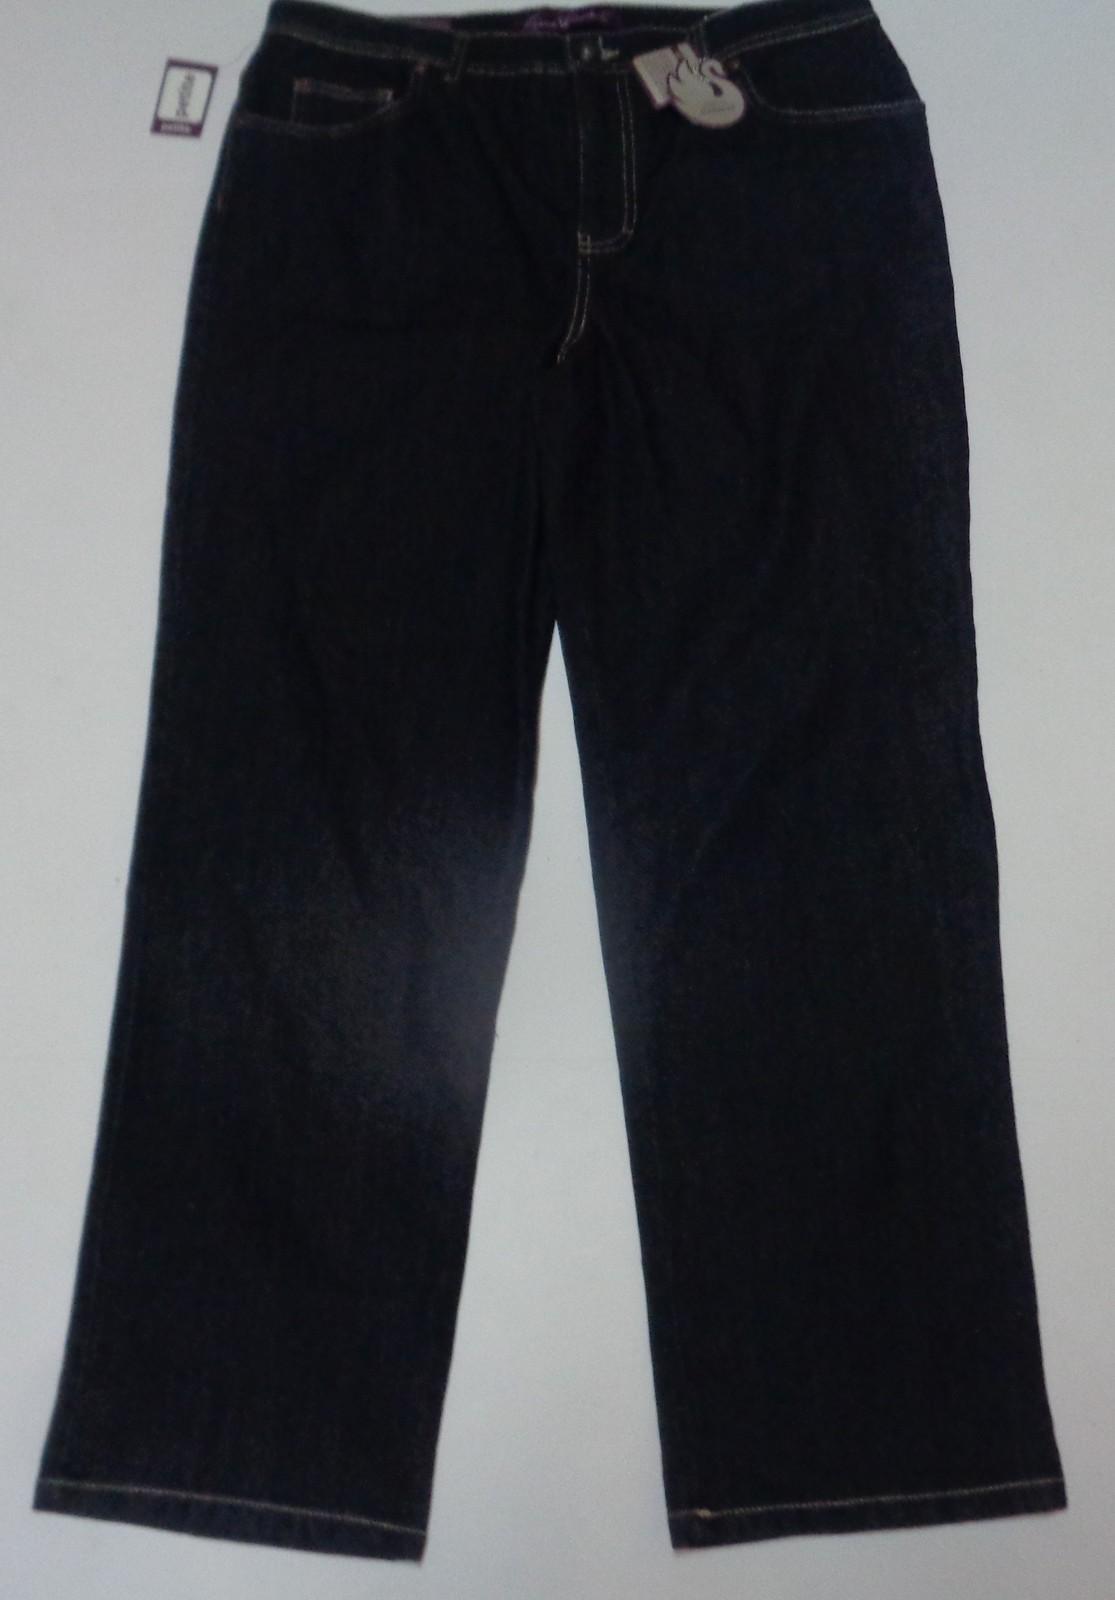 Gloria Vanderbilt Women's Blue Jeans NWT Sz 16P Stretch Classic Fit